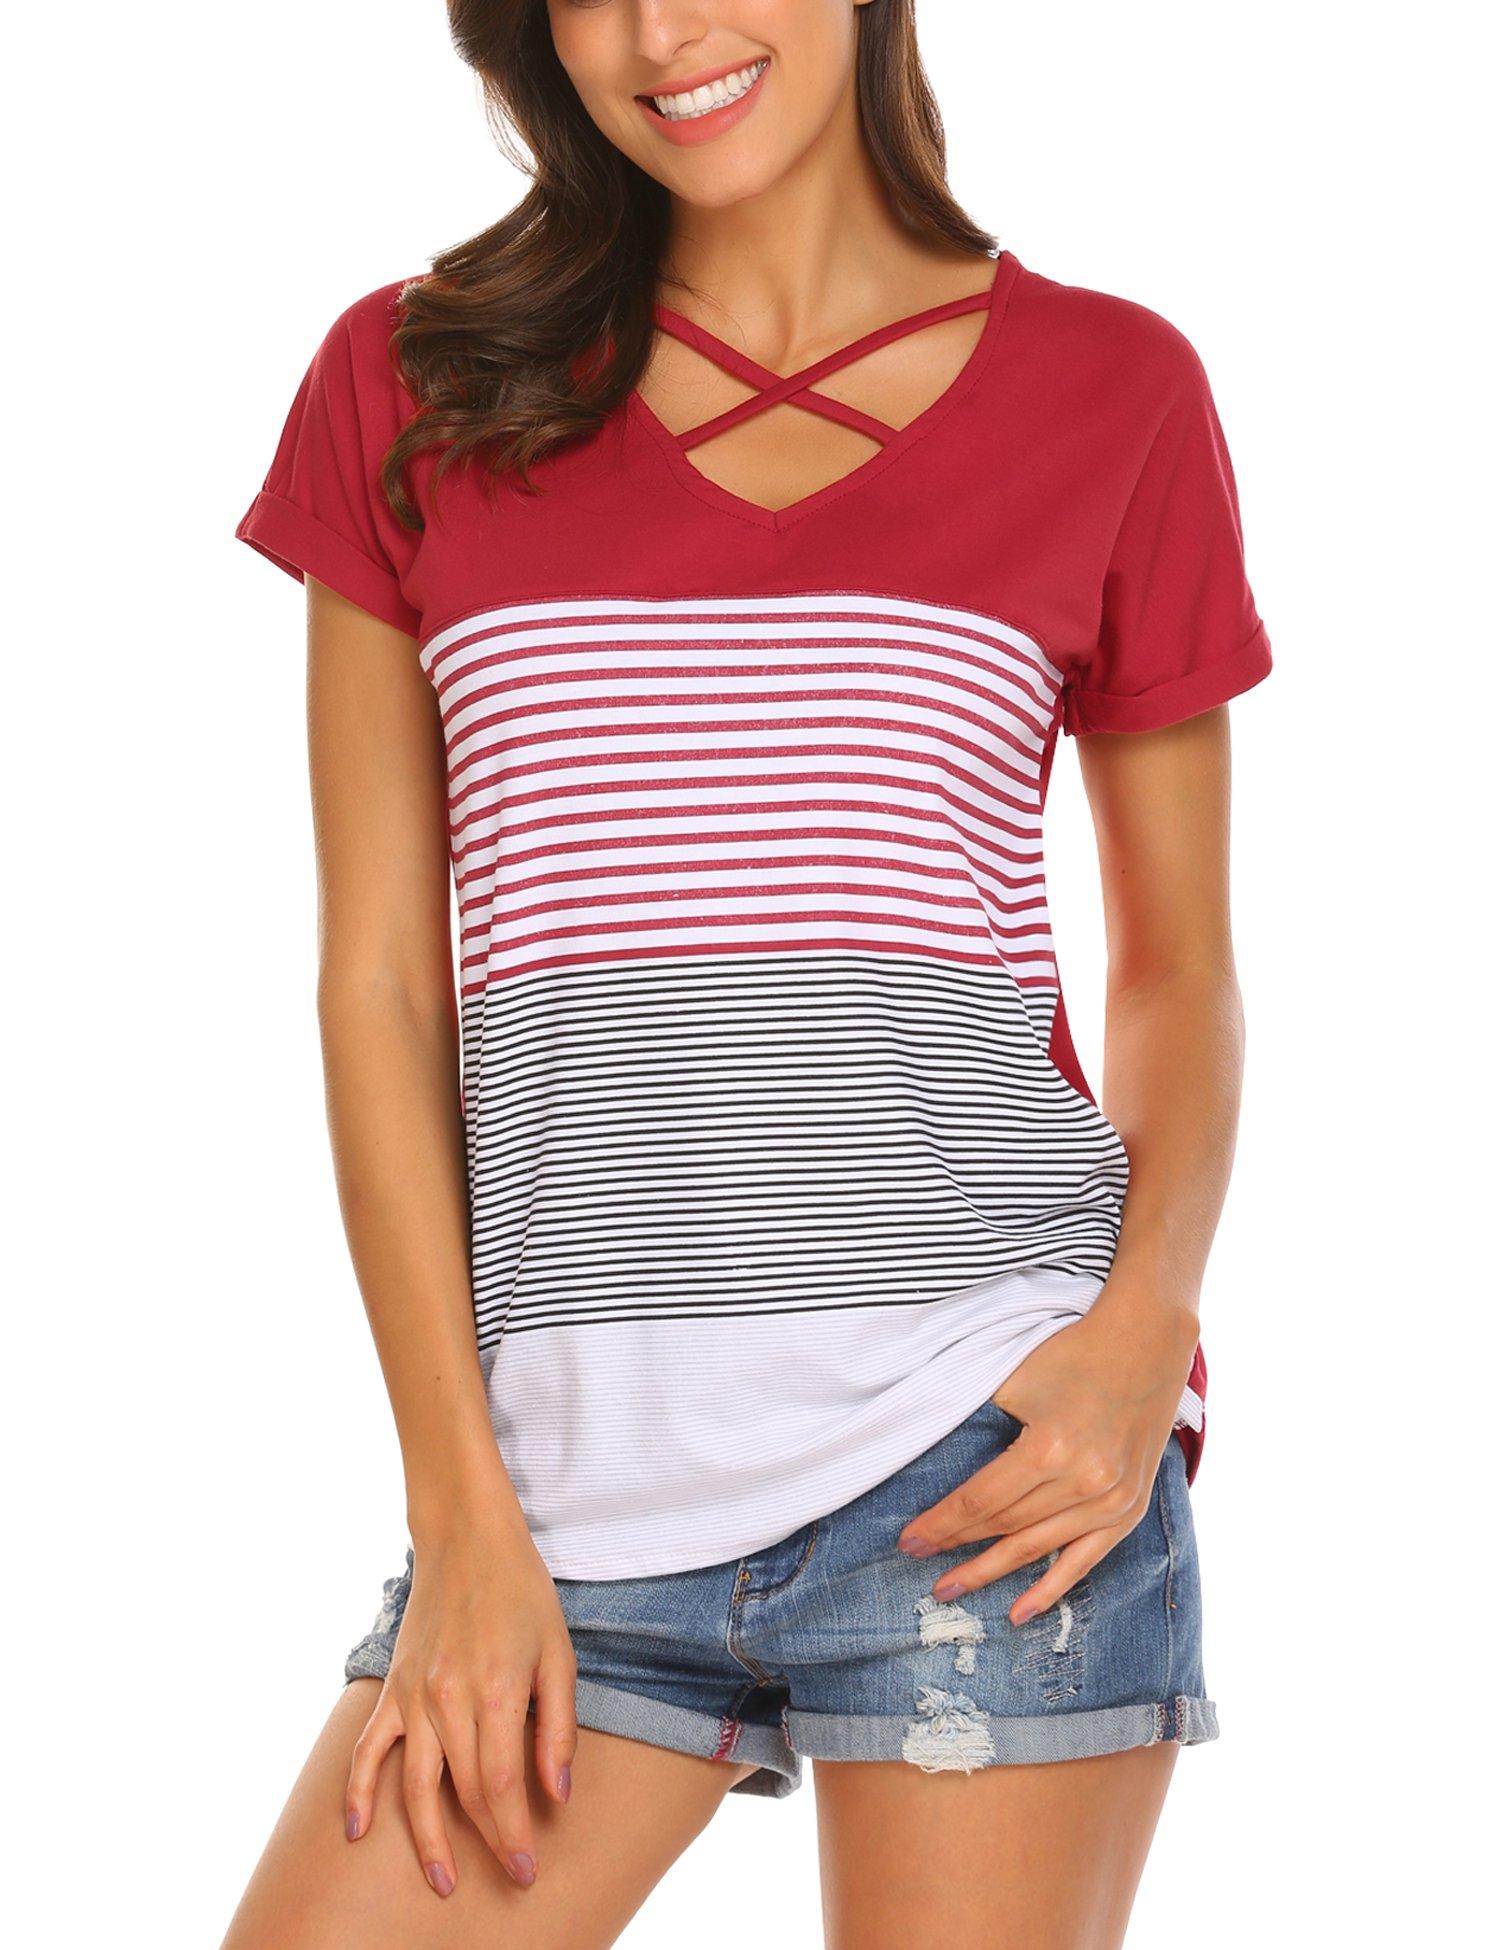 Venena Women's Short Sleeve Triple Color Block Stripe Criss Cross T Shirt Tunic Tops